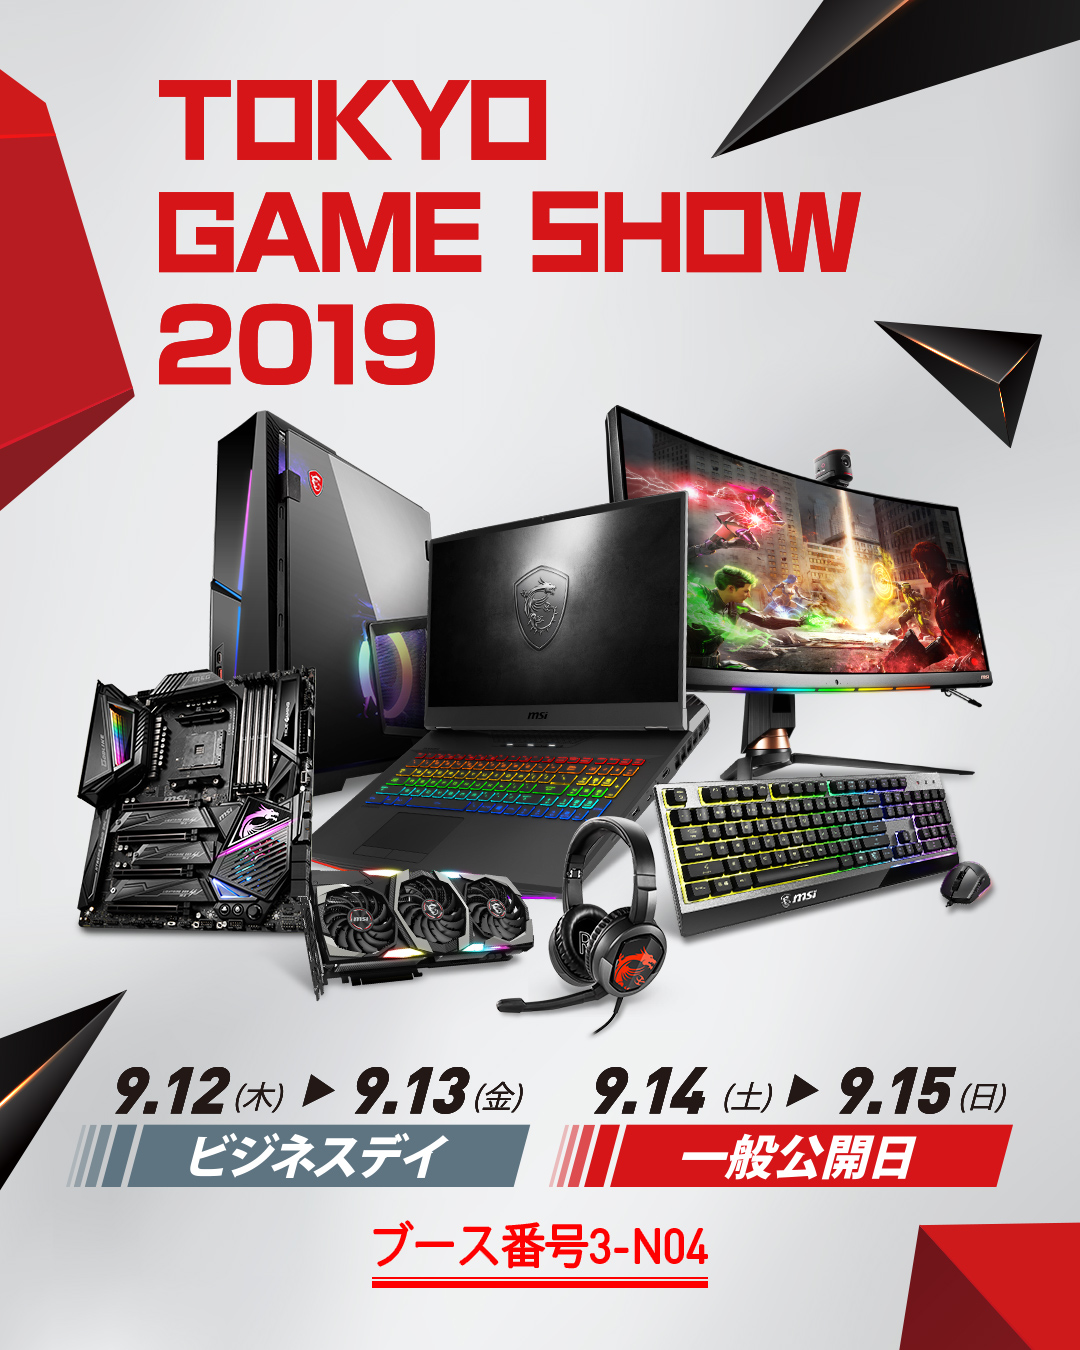 2019 Tokyo Game Show 特設サイト